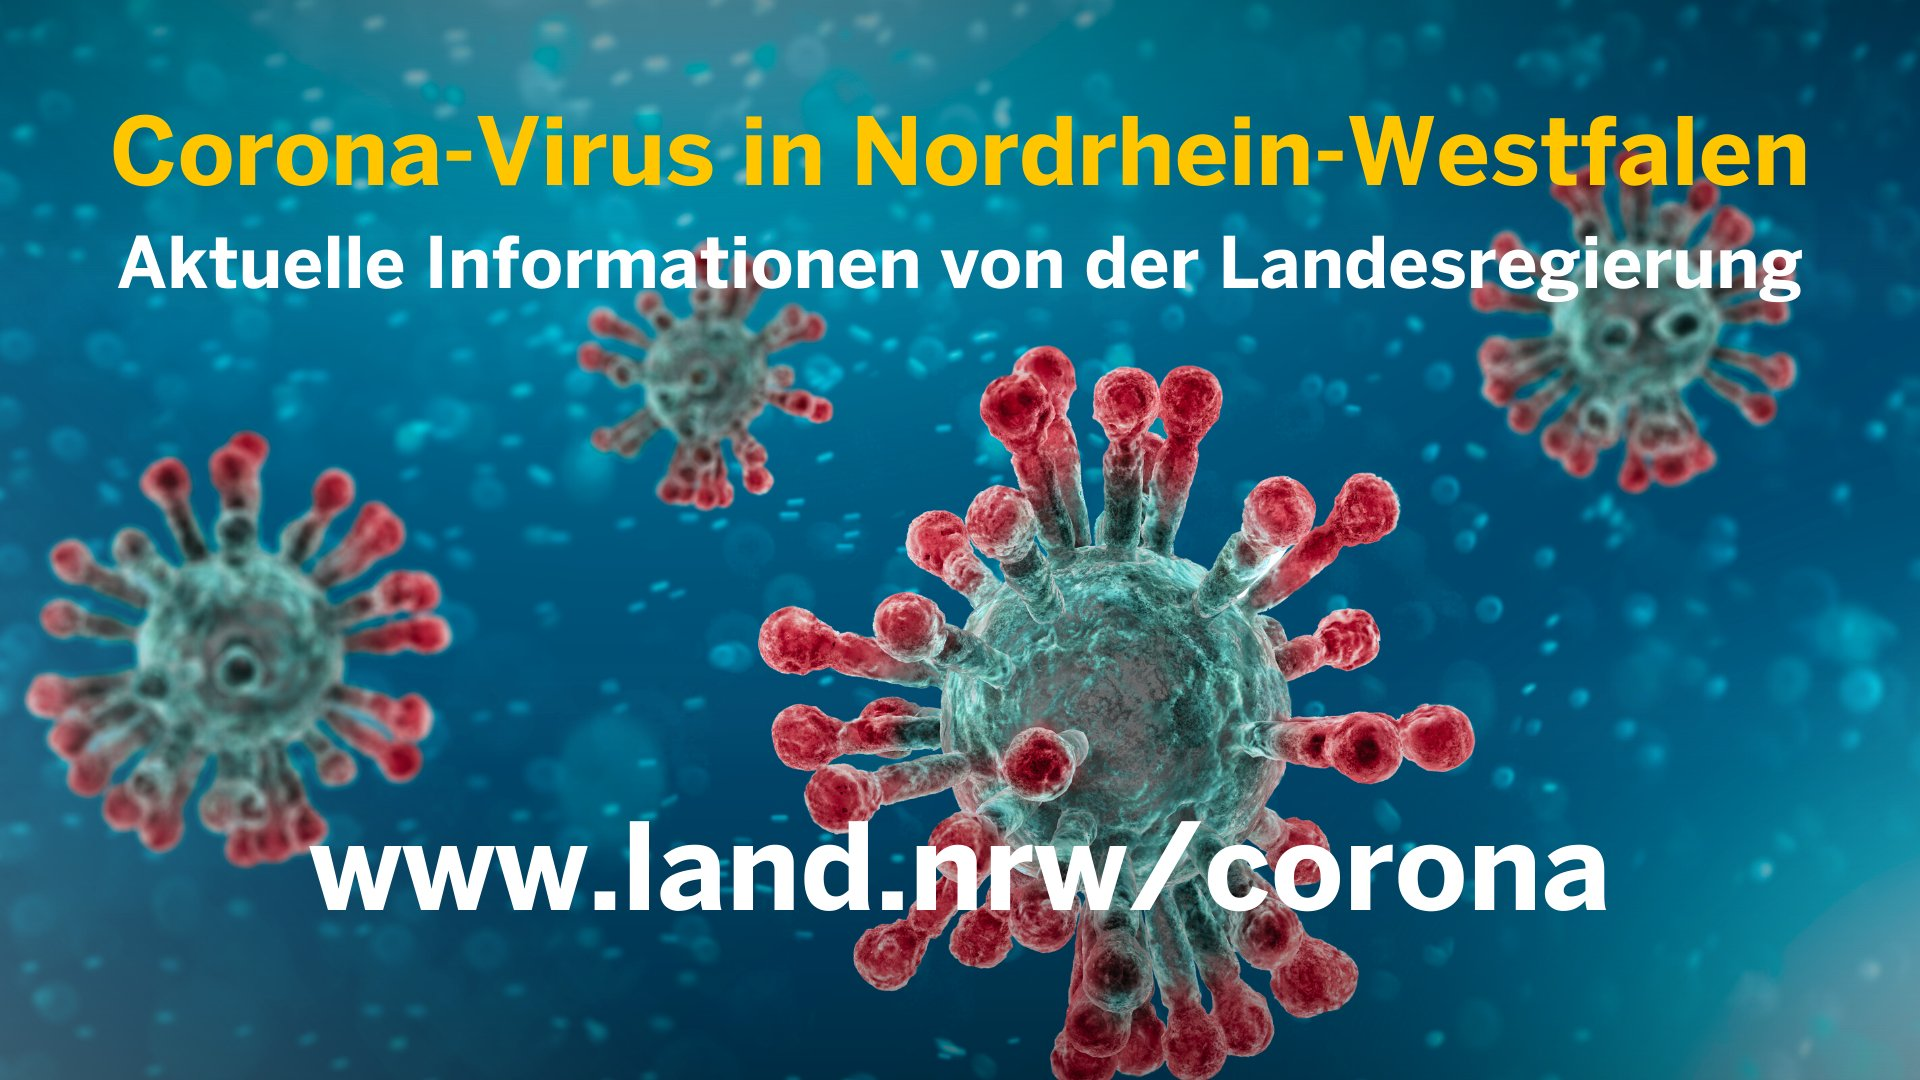 Virus Nrw